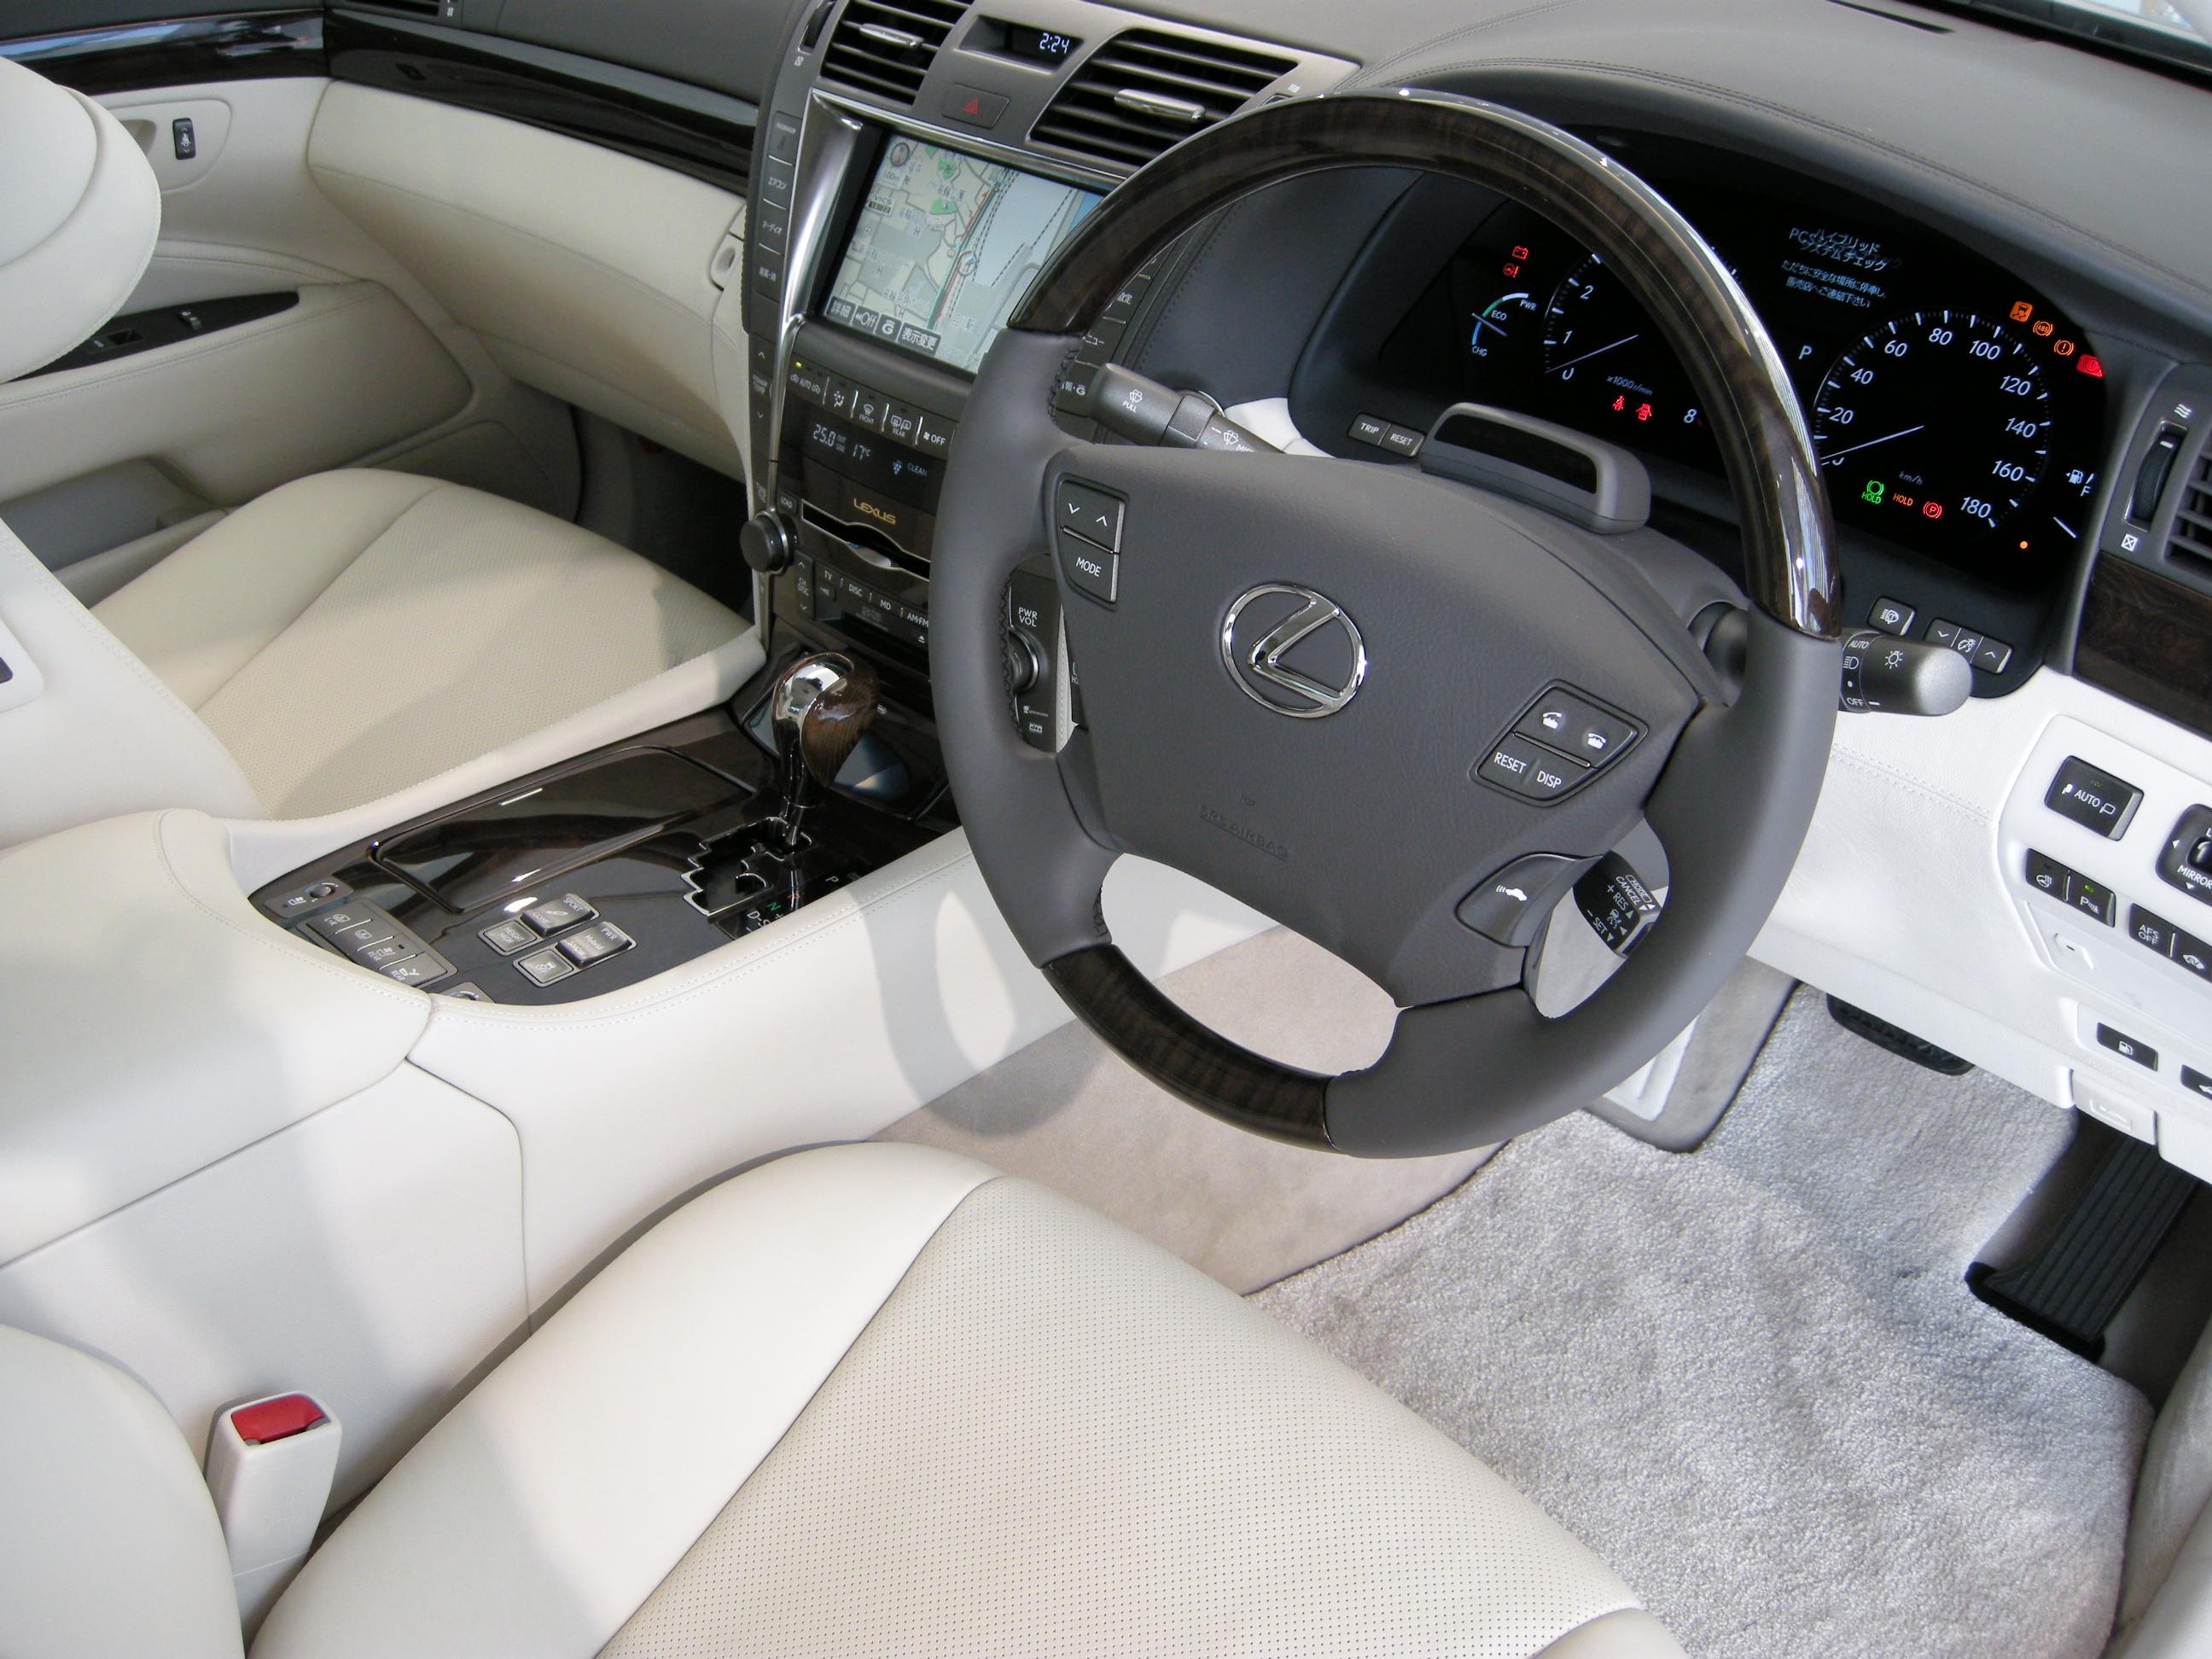 https://upload.wikimedia.org/wikipedia/commons/8/88/Lexus_LS600hL_01.JPG